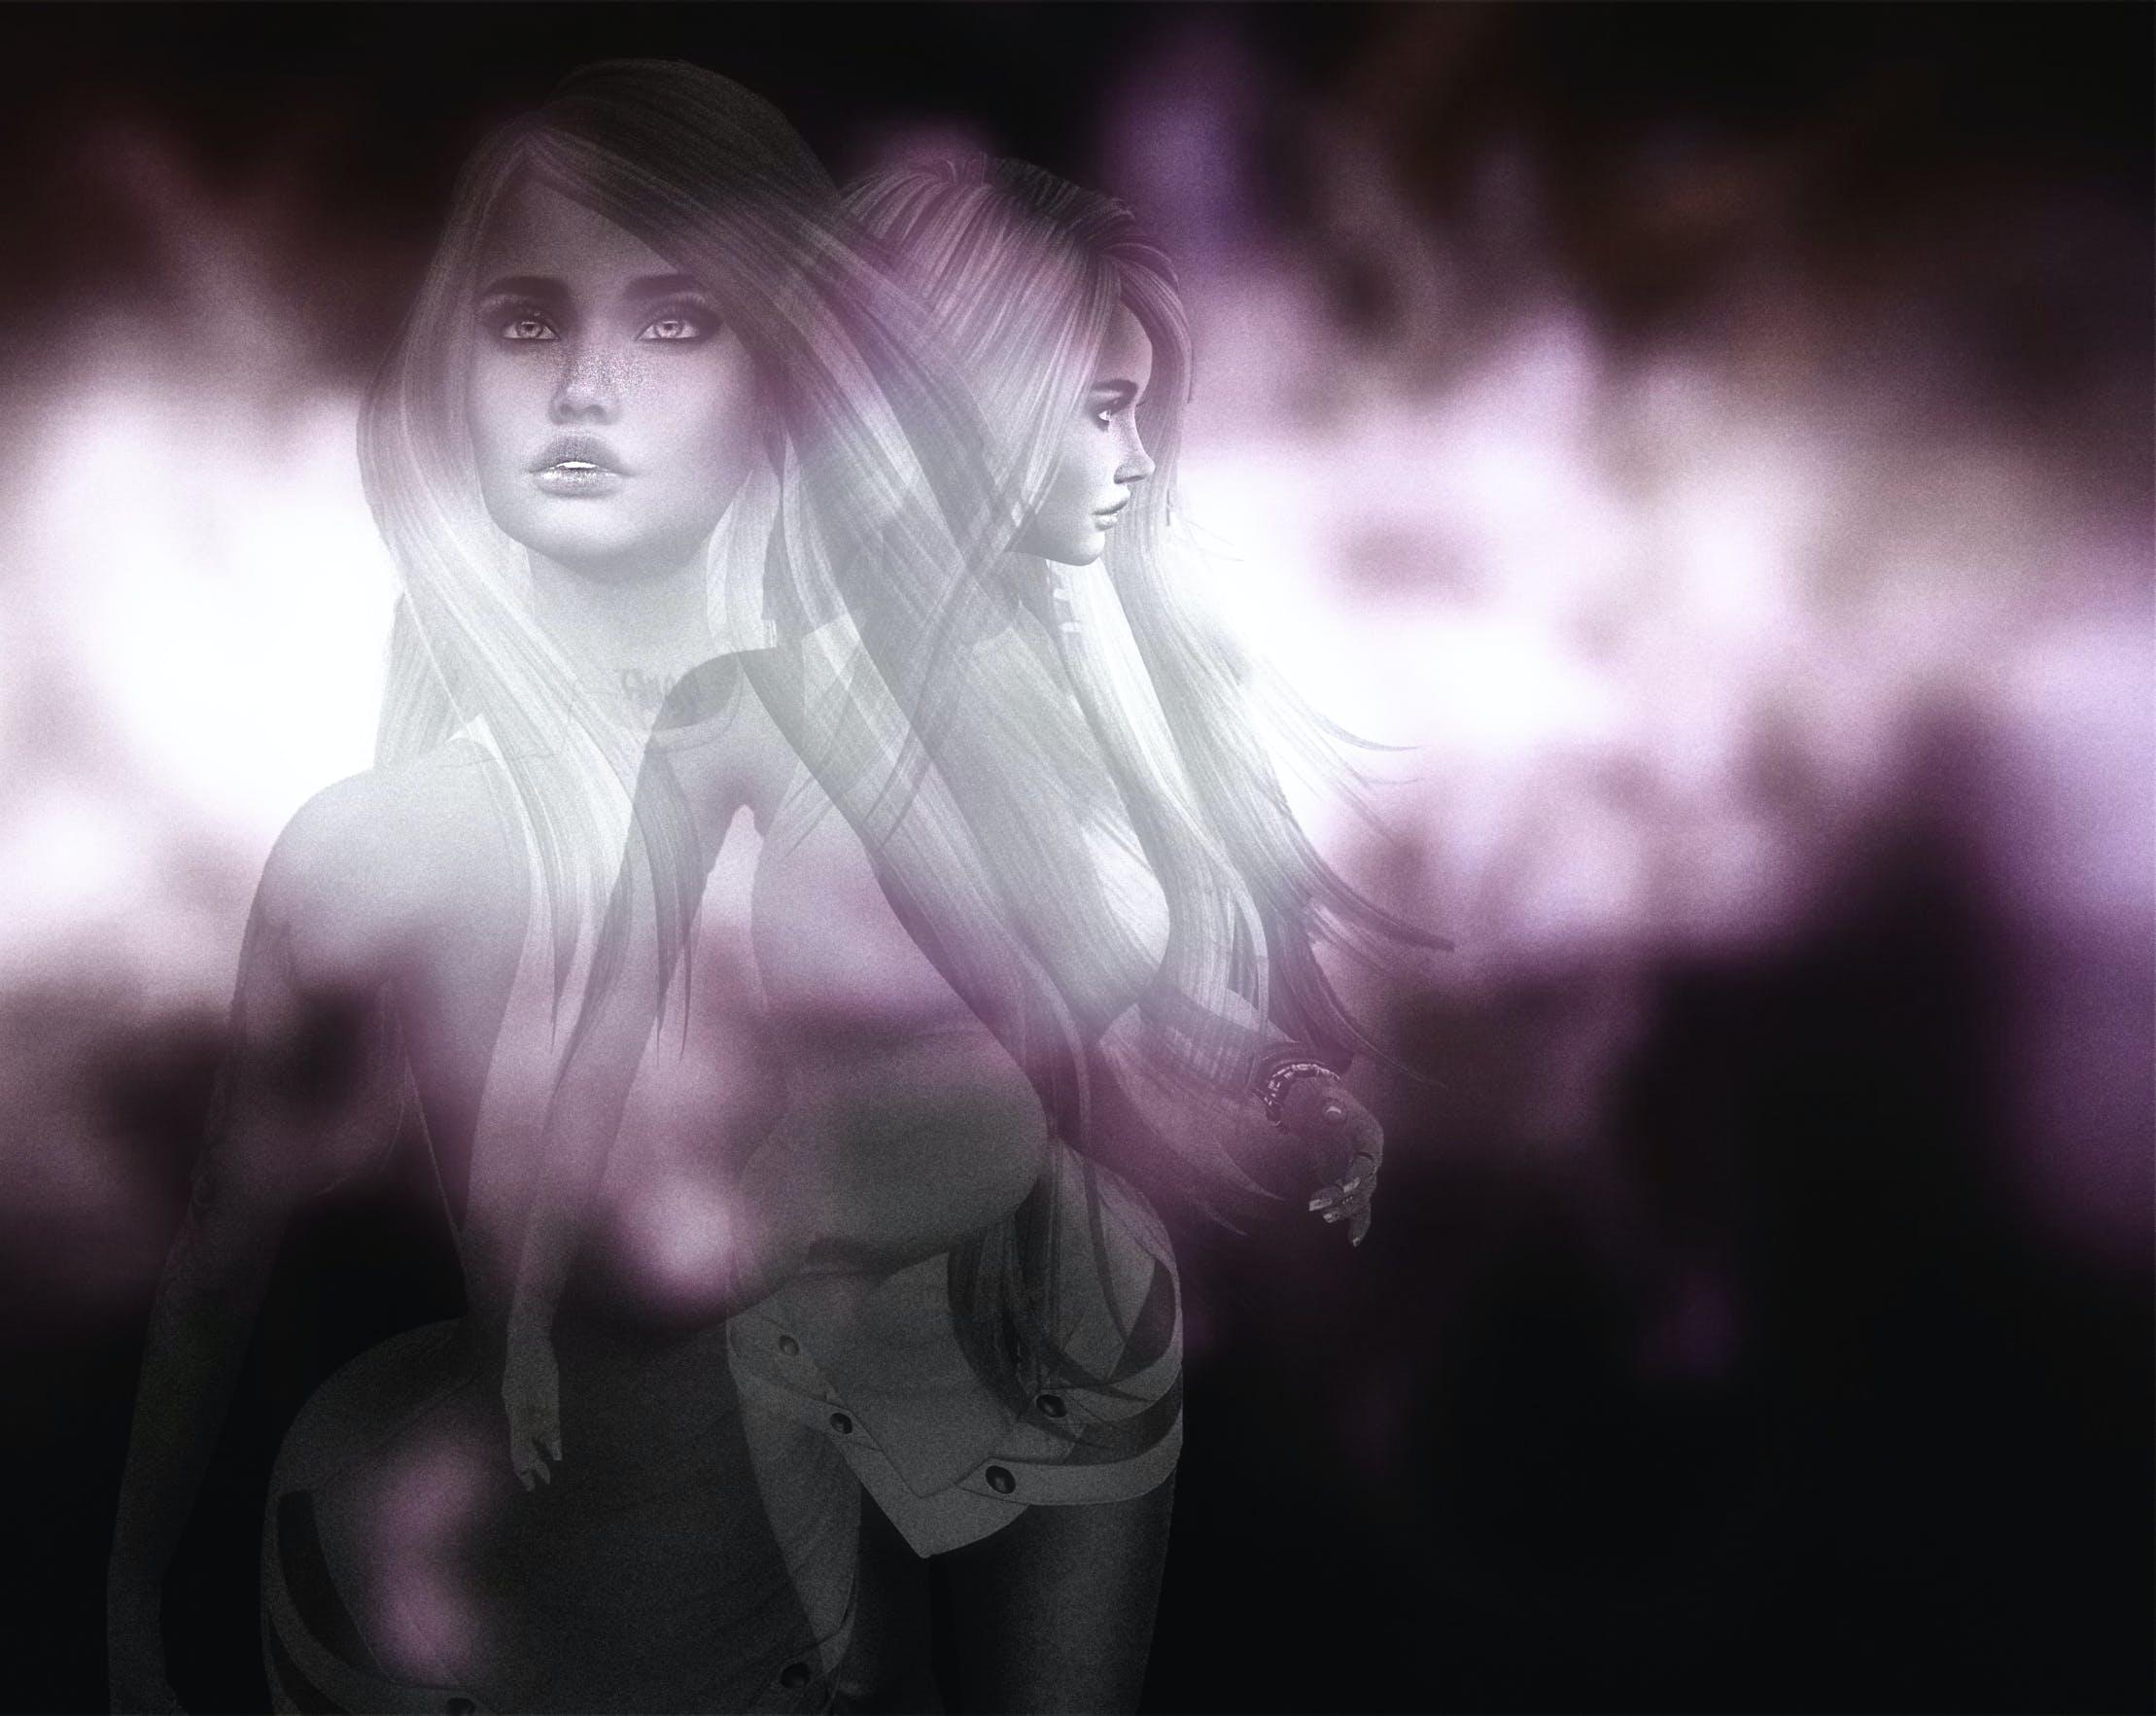 Free stock photo of woman, digital art, abstract photo